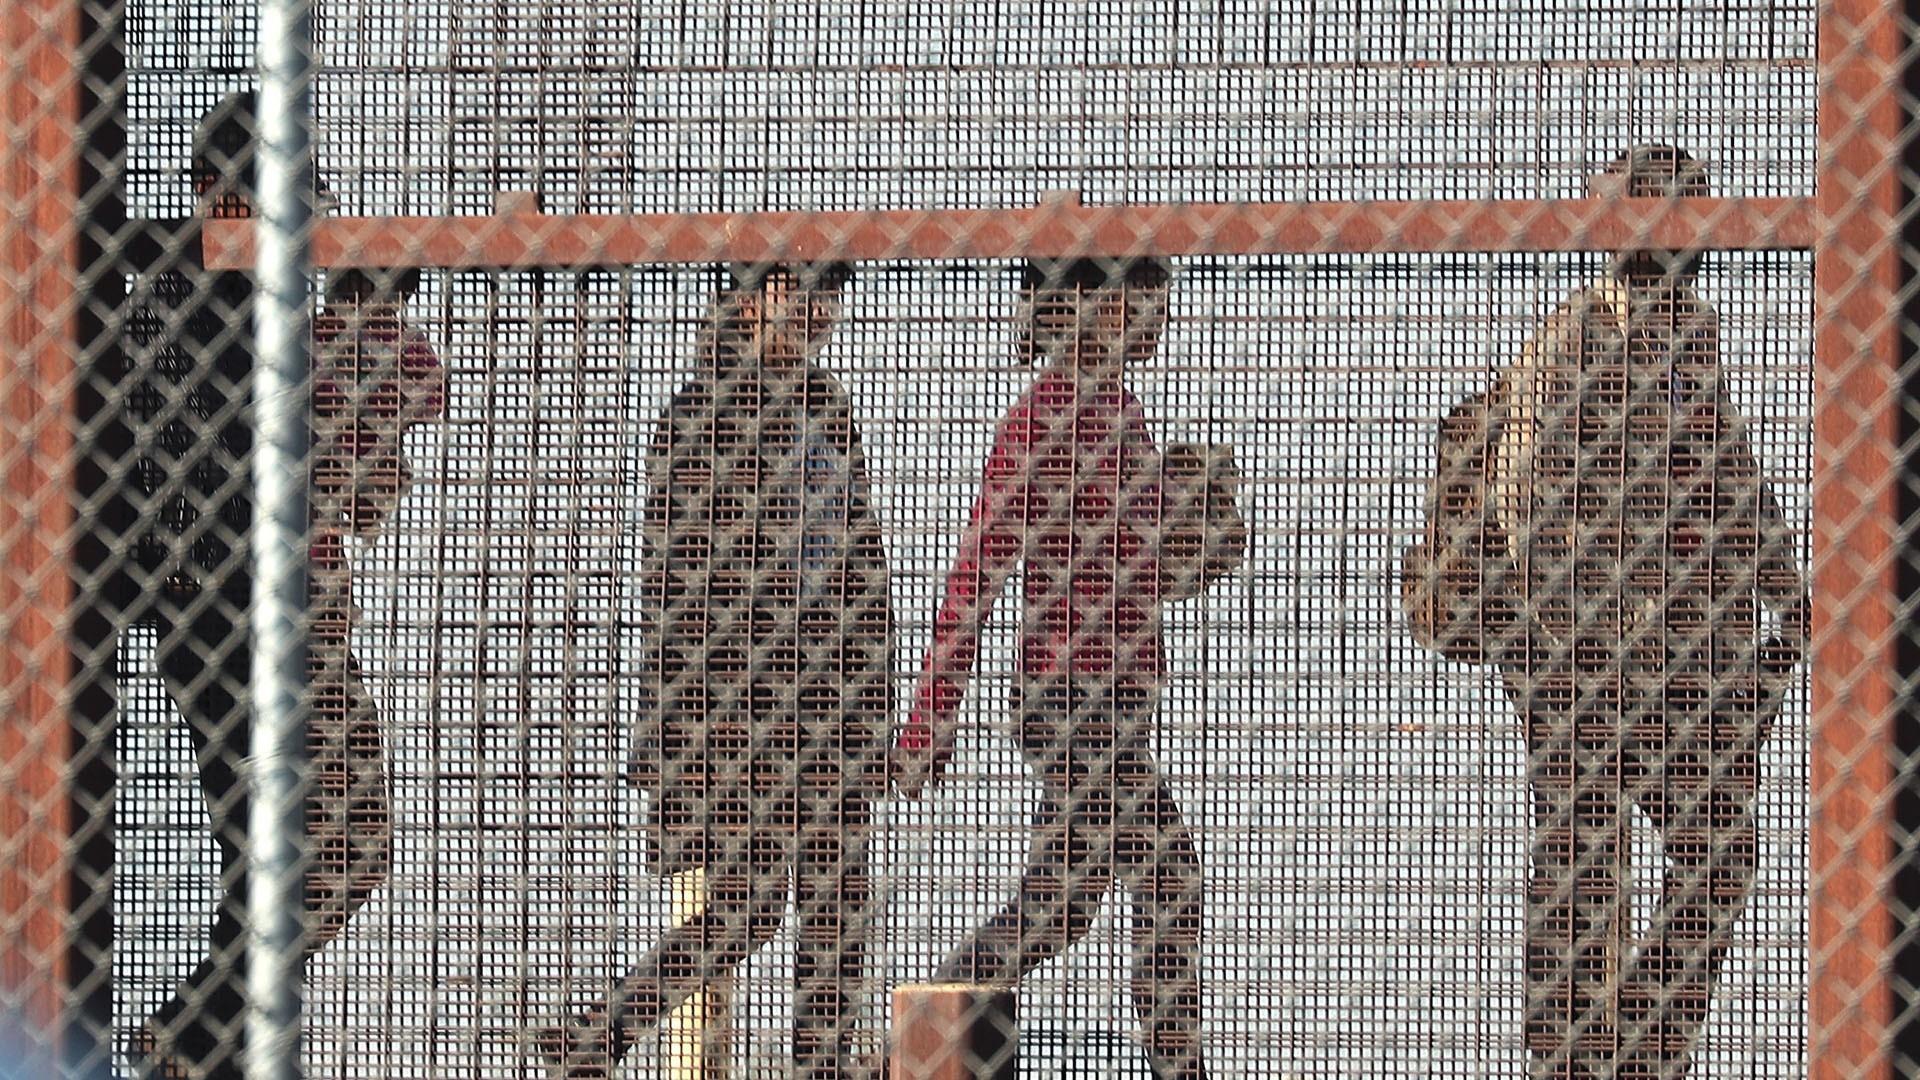 Border crossings may drop as result of summer season, not Trump deal